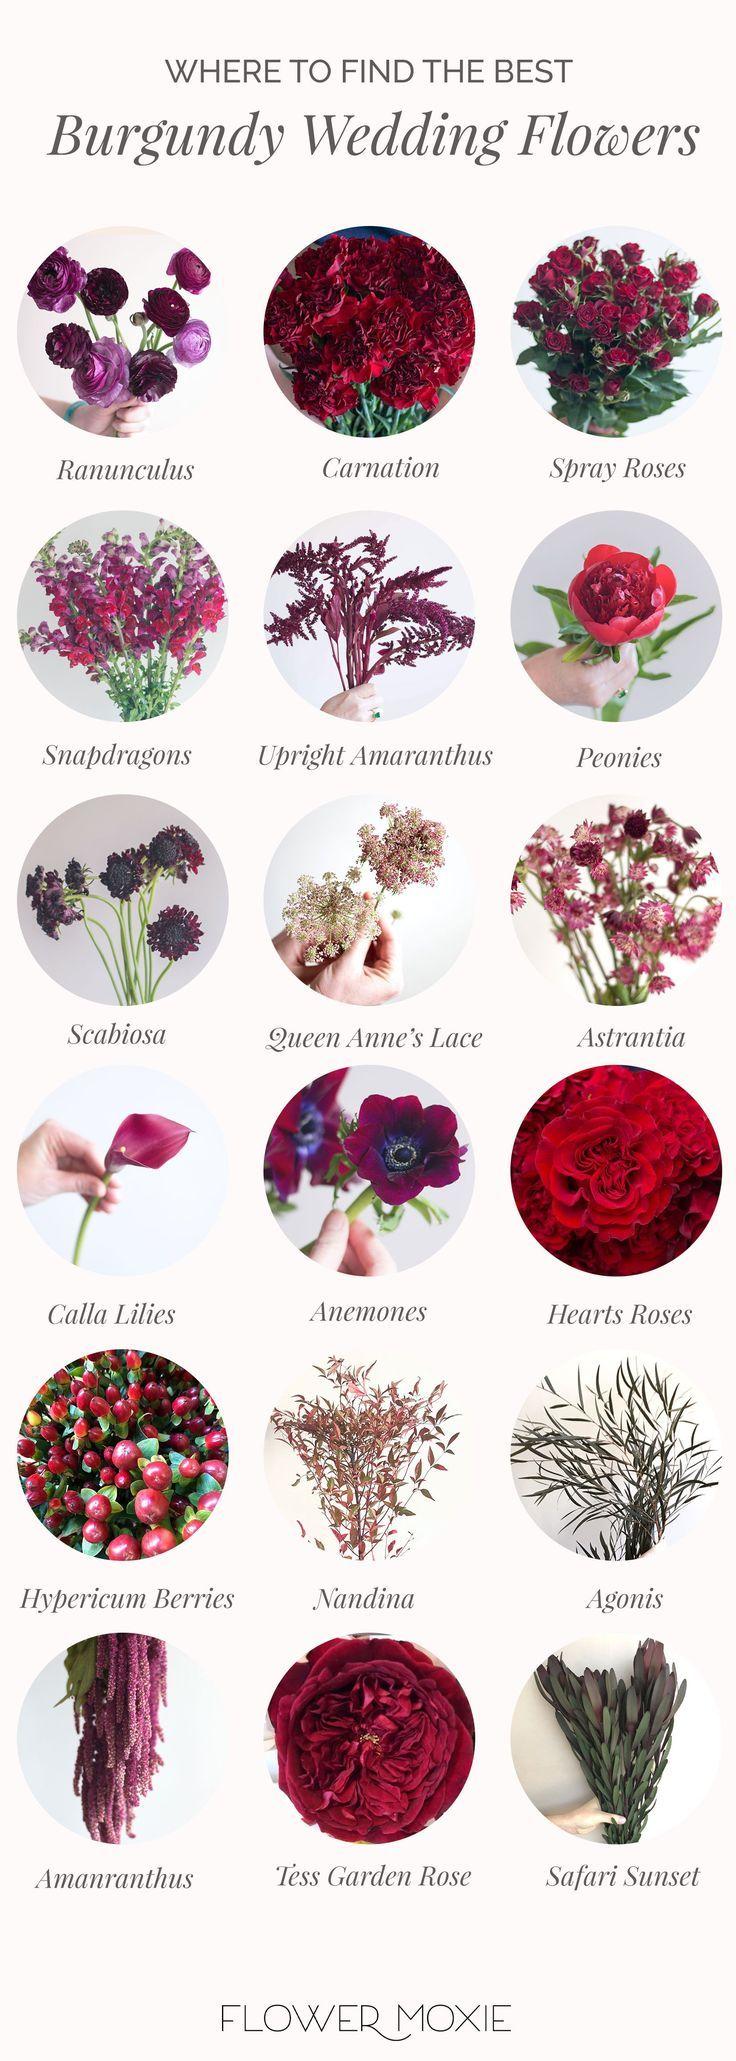 Flowermoxie Bulk Wedding Flowers Online Fresh Flowers For Weddings In 2020 Online Wedding Flowers Bulk Wedding Flowers Fresh Wedding Flowers